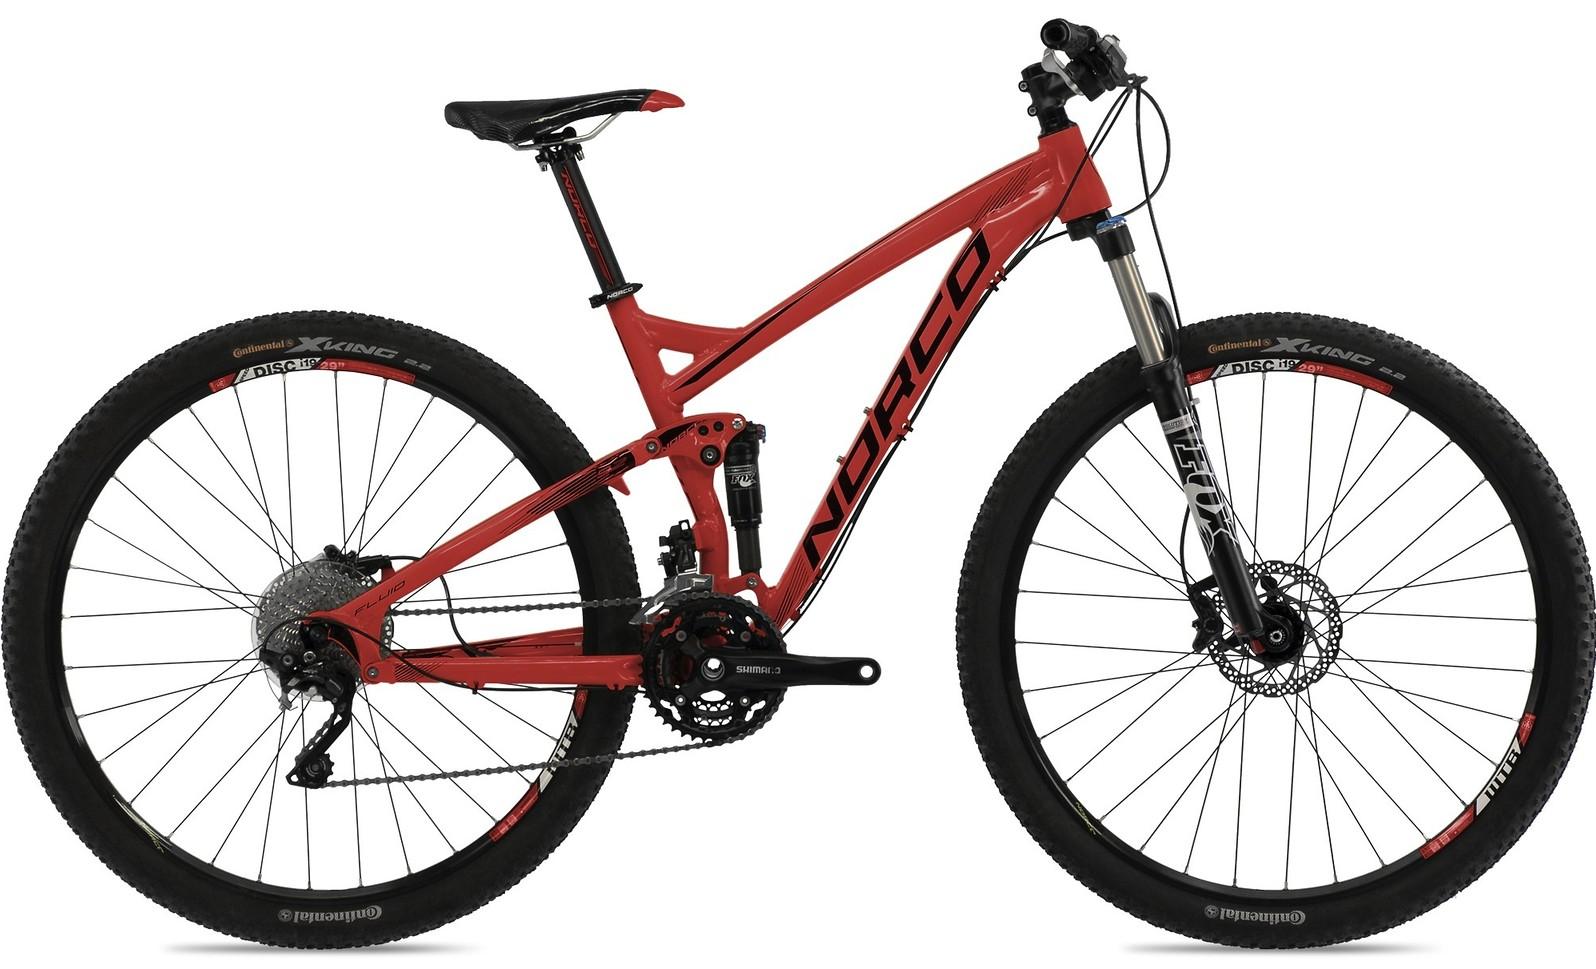 bike - 2014 Norco Fluid 9.2 - red/black